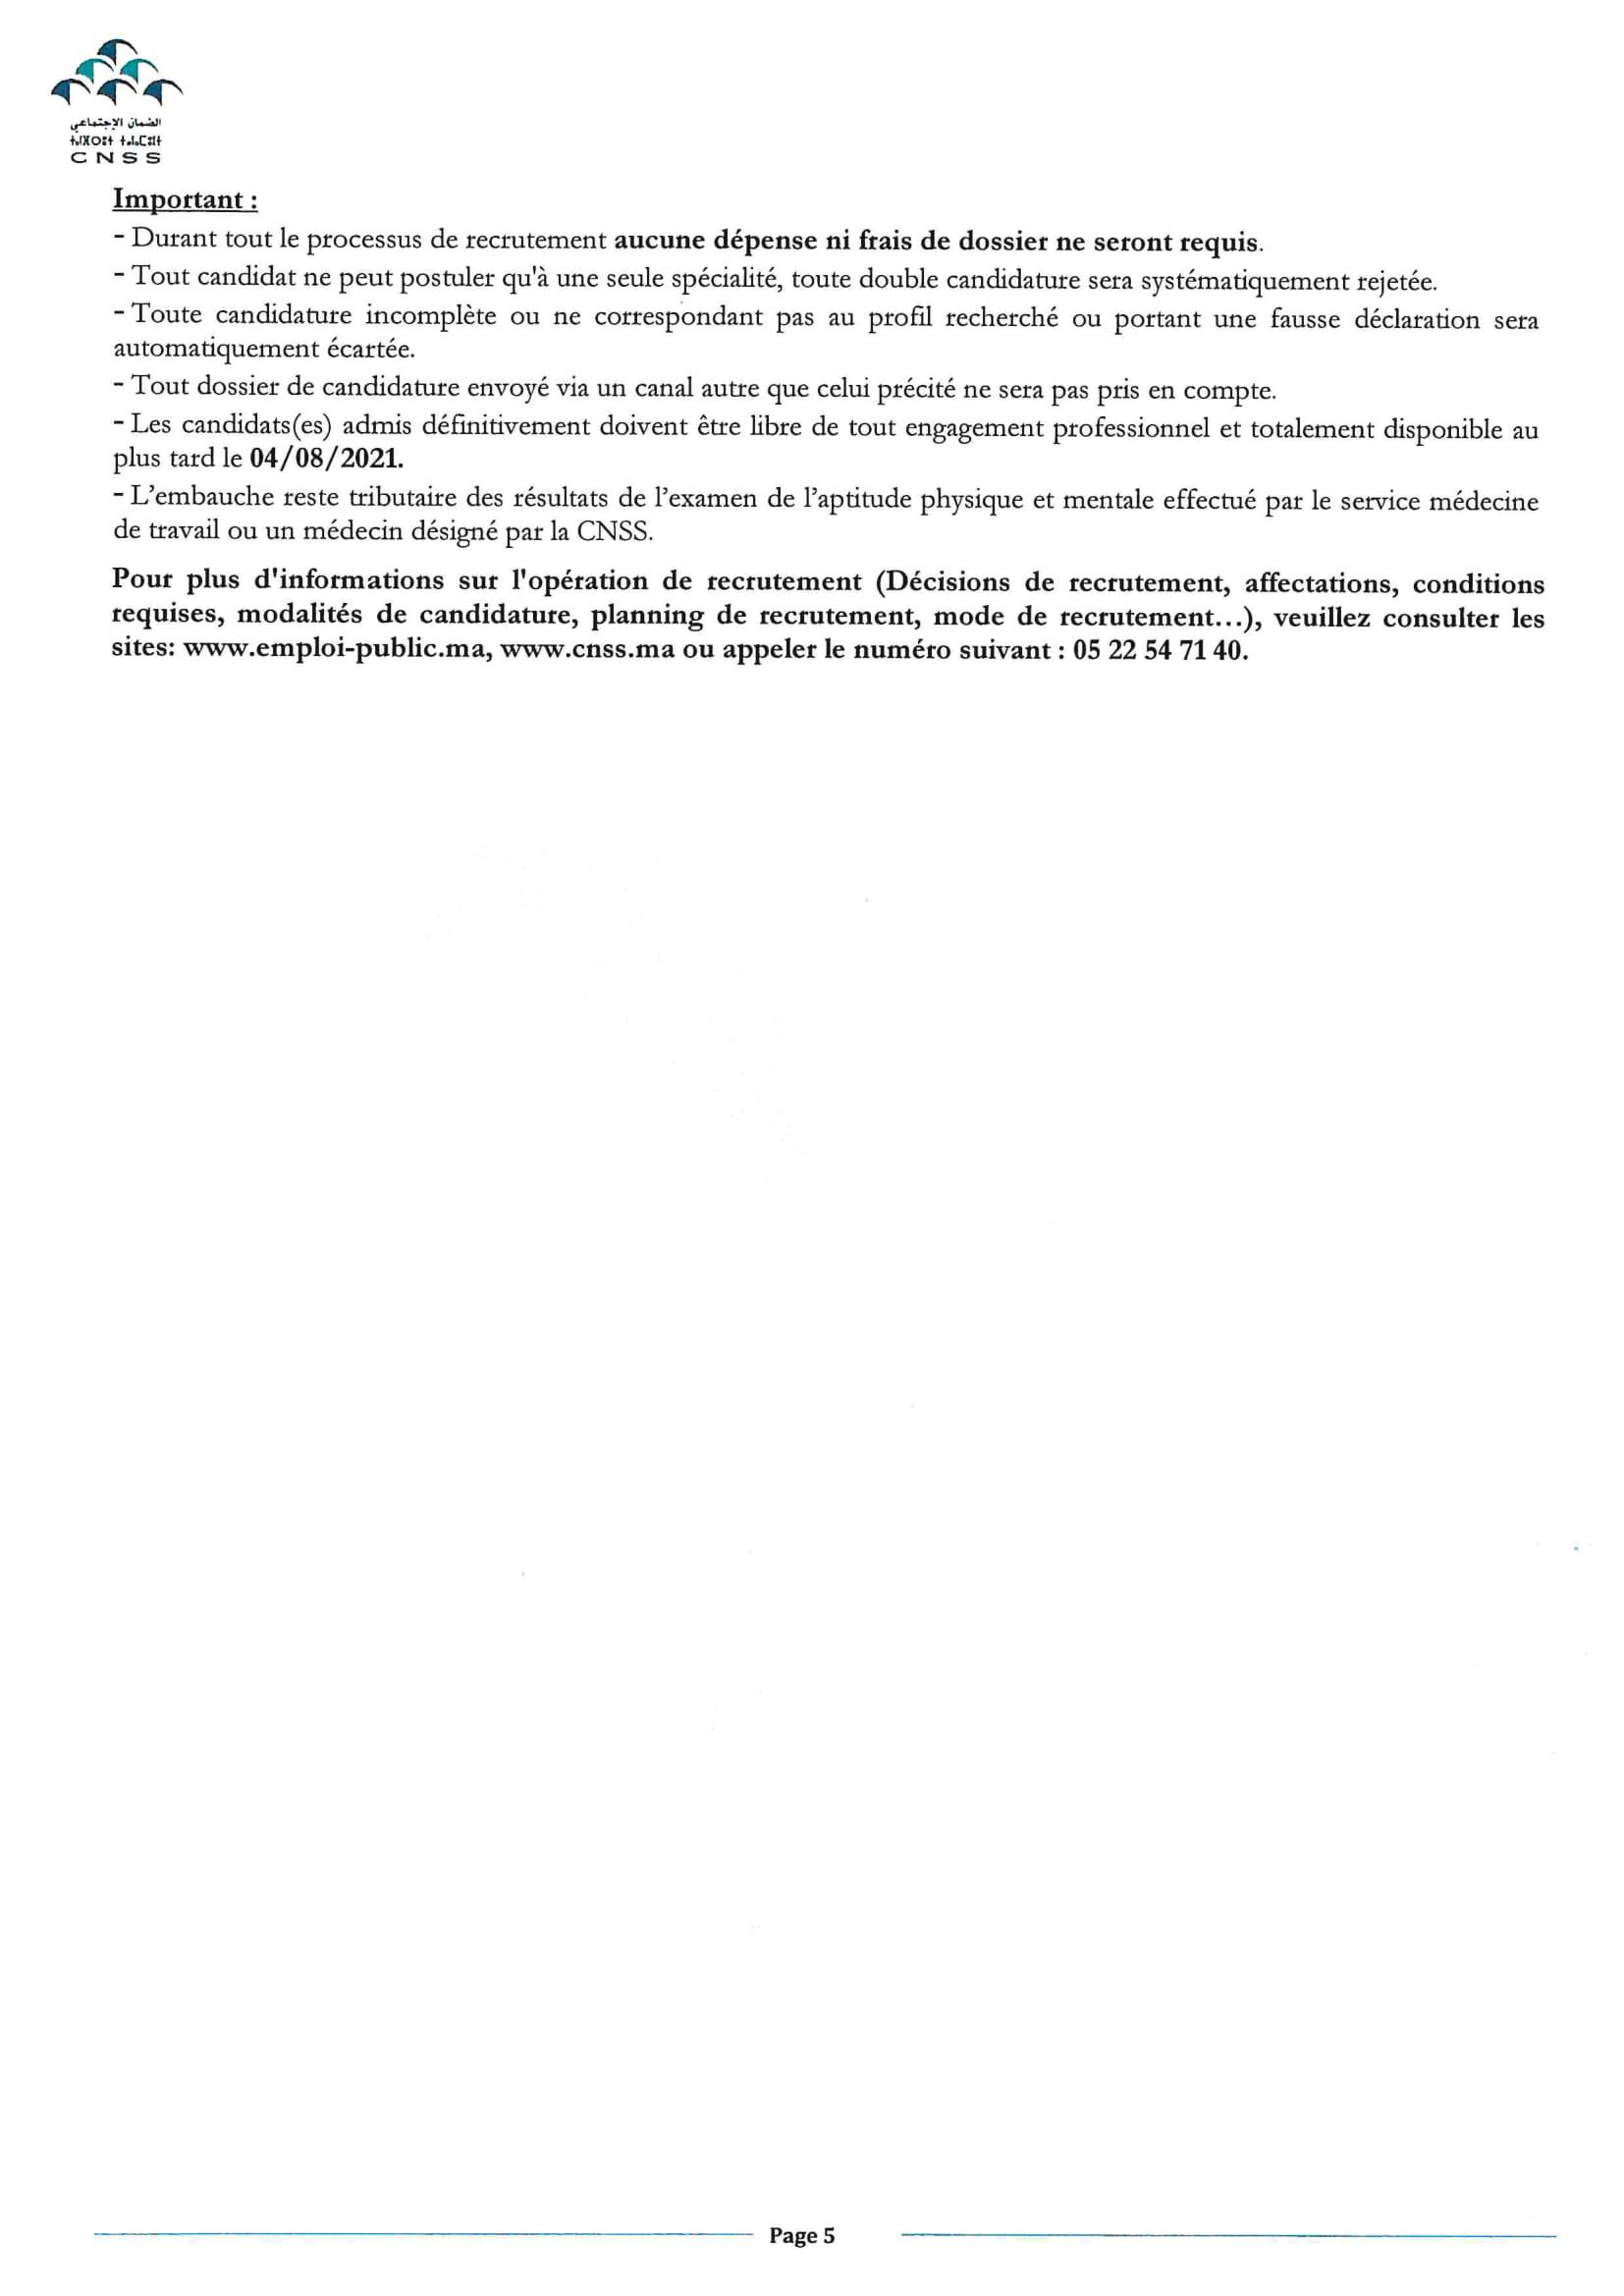 Avis Recrutement Concours CNSS 2021 5